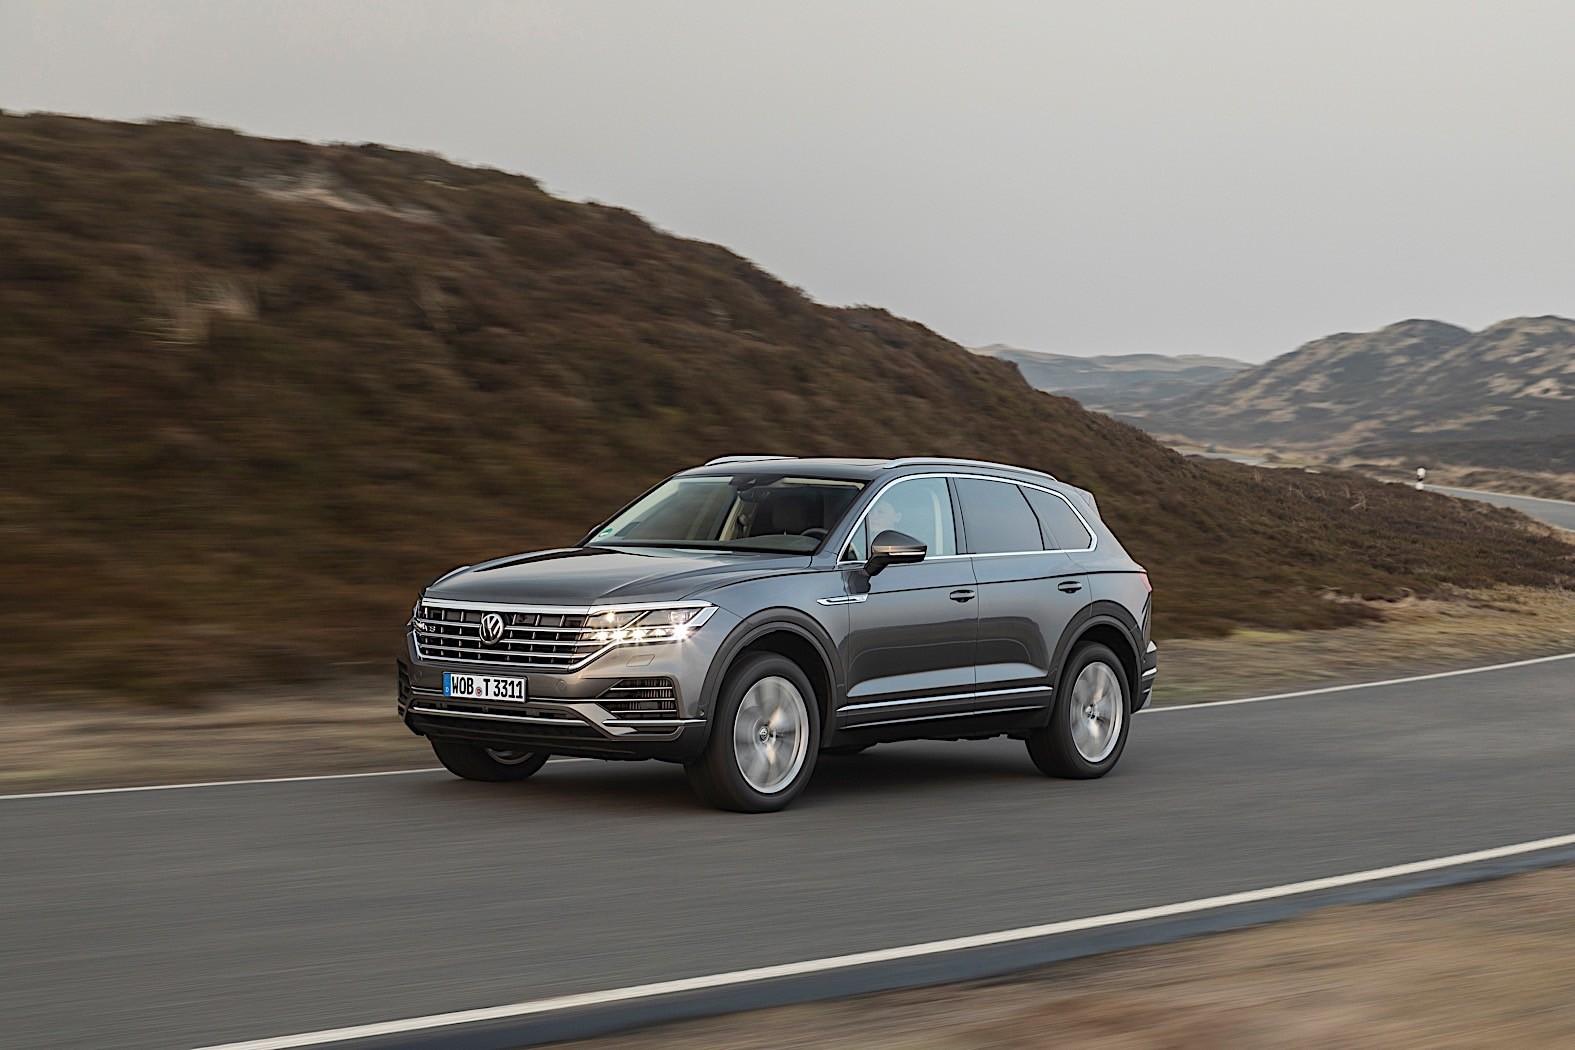 2020 Volkswagen Touareg Gets Top of the Range V8 TDI ...